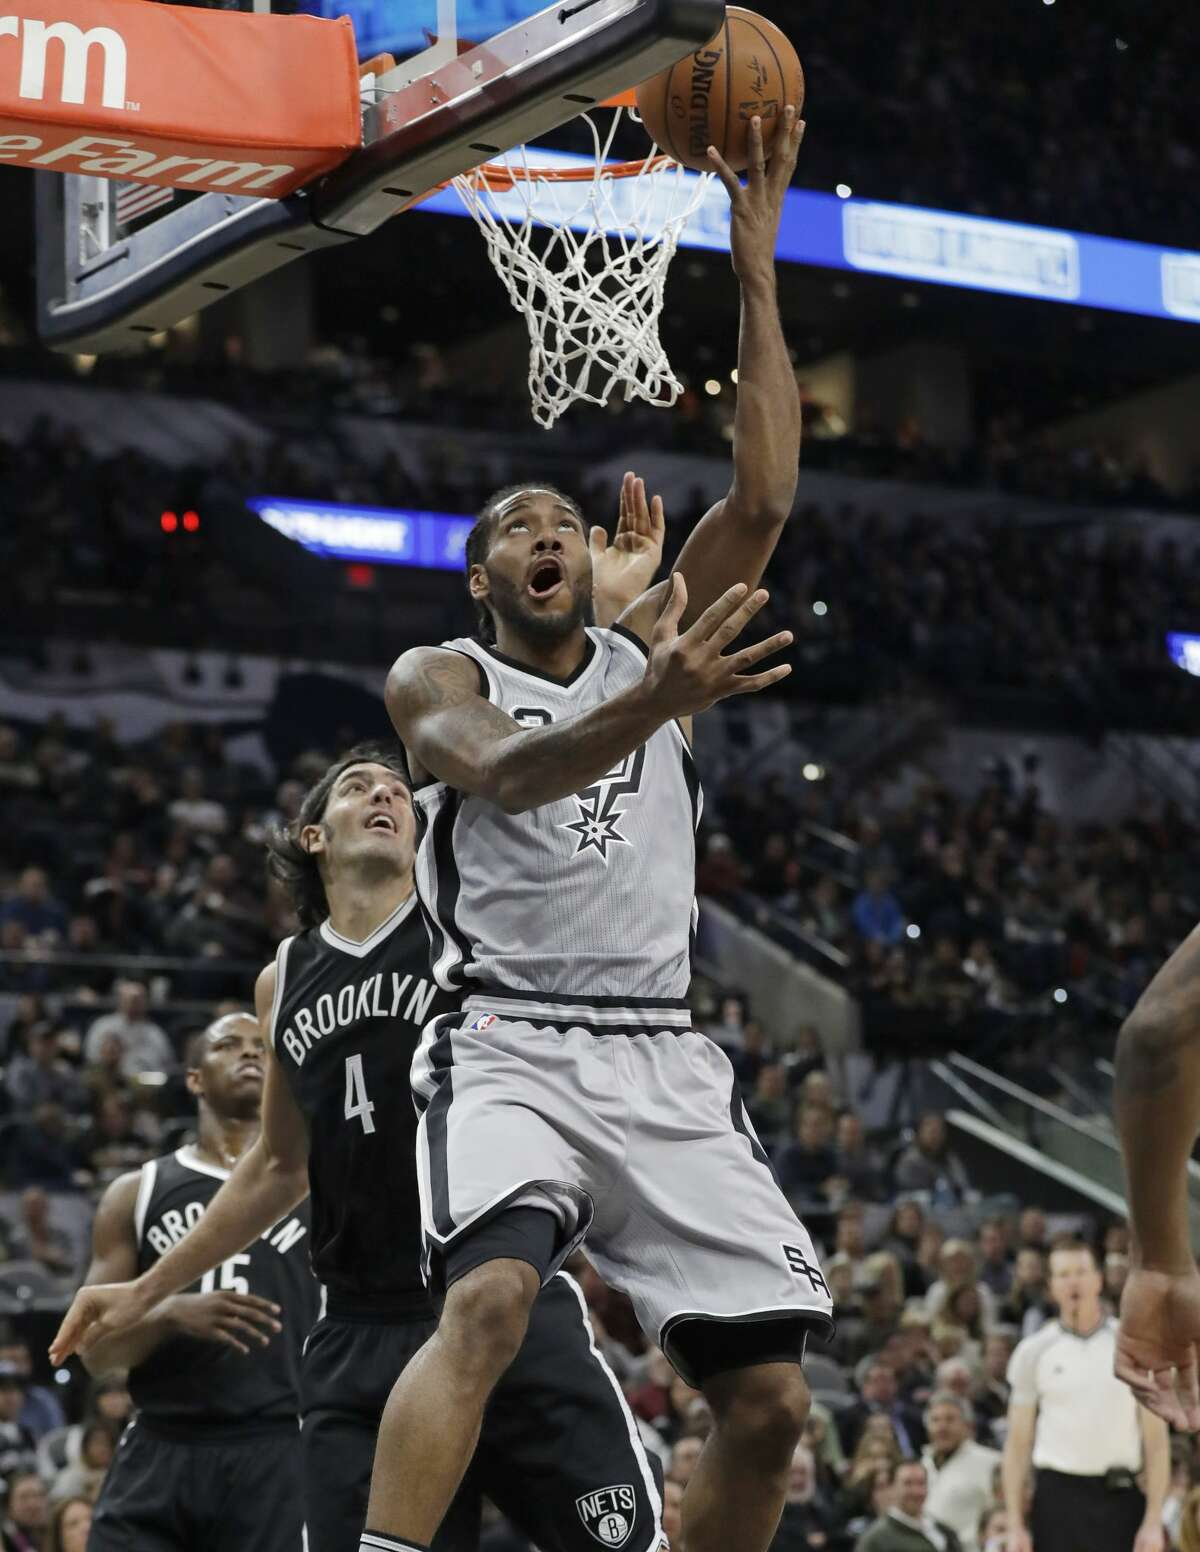 San Antonio Spurs forward Kawhi Leonard (2) drives around Brooklyn Nets forward Luis Scola (4) to score during the first half of an NBA basketball game, Saturday, Dec. 10, 2016, in San Antonio. (AP Photo/Eric Gay)